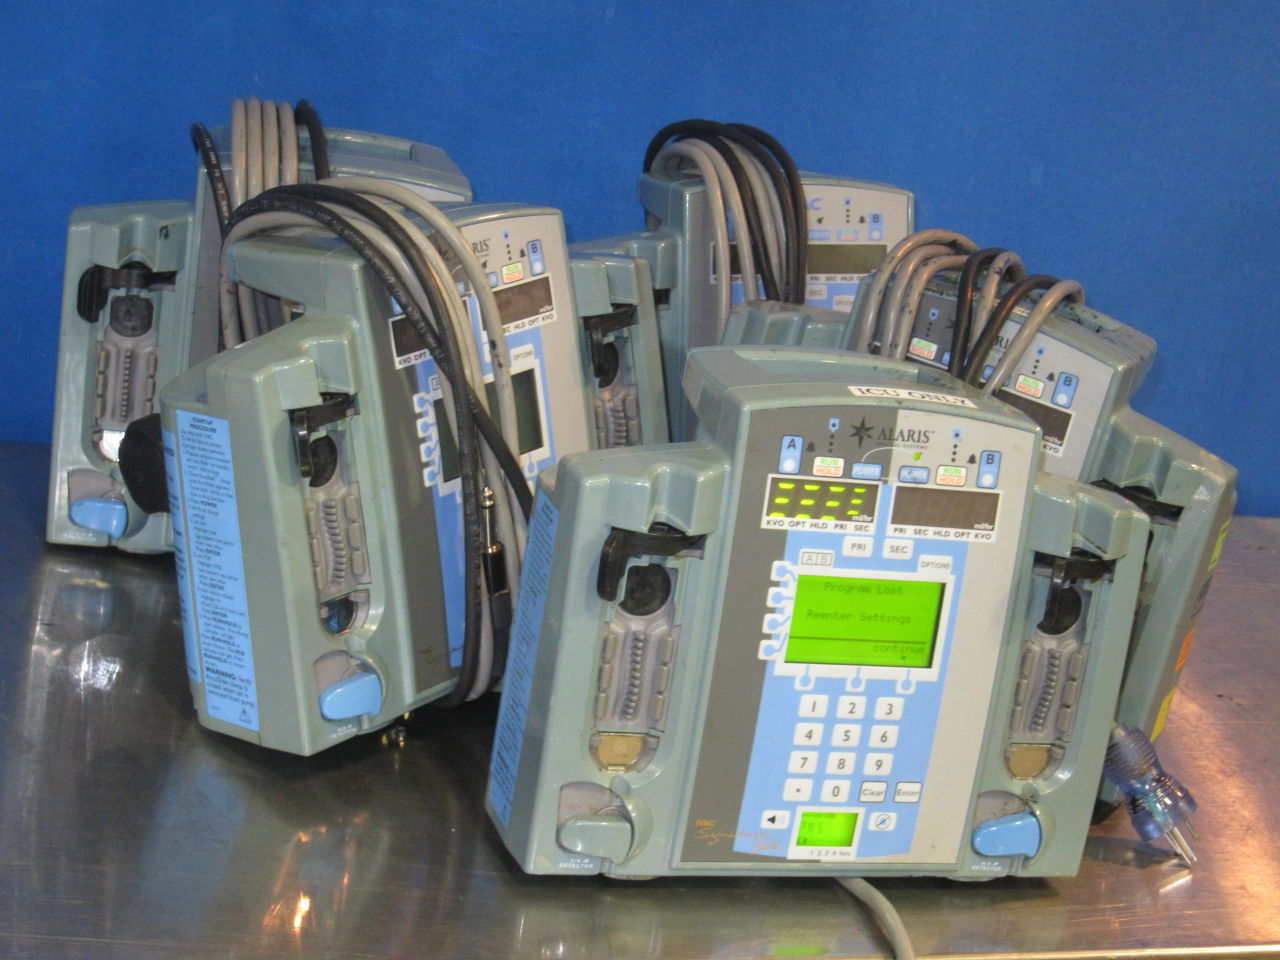 ALARIS 7230D  - Lot of 5 Pump IV Infusion